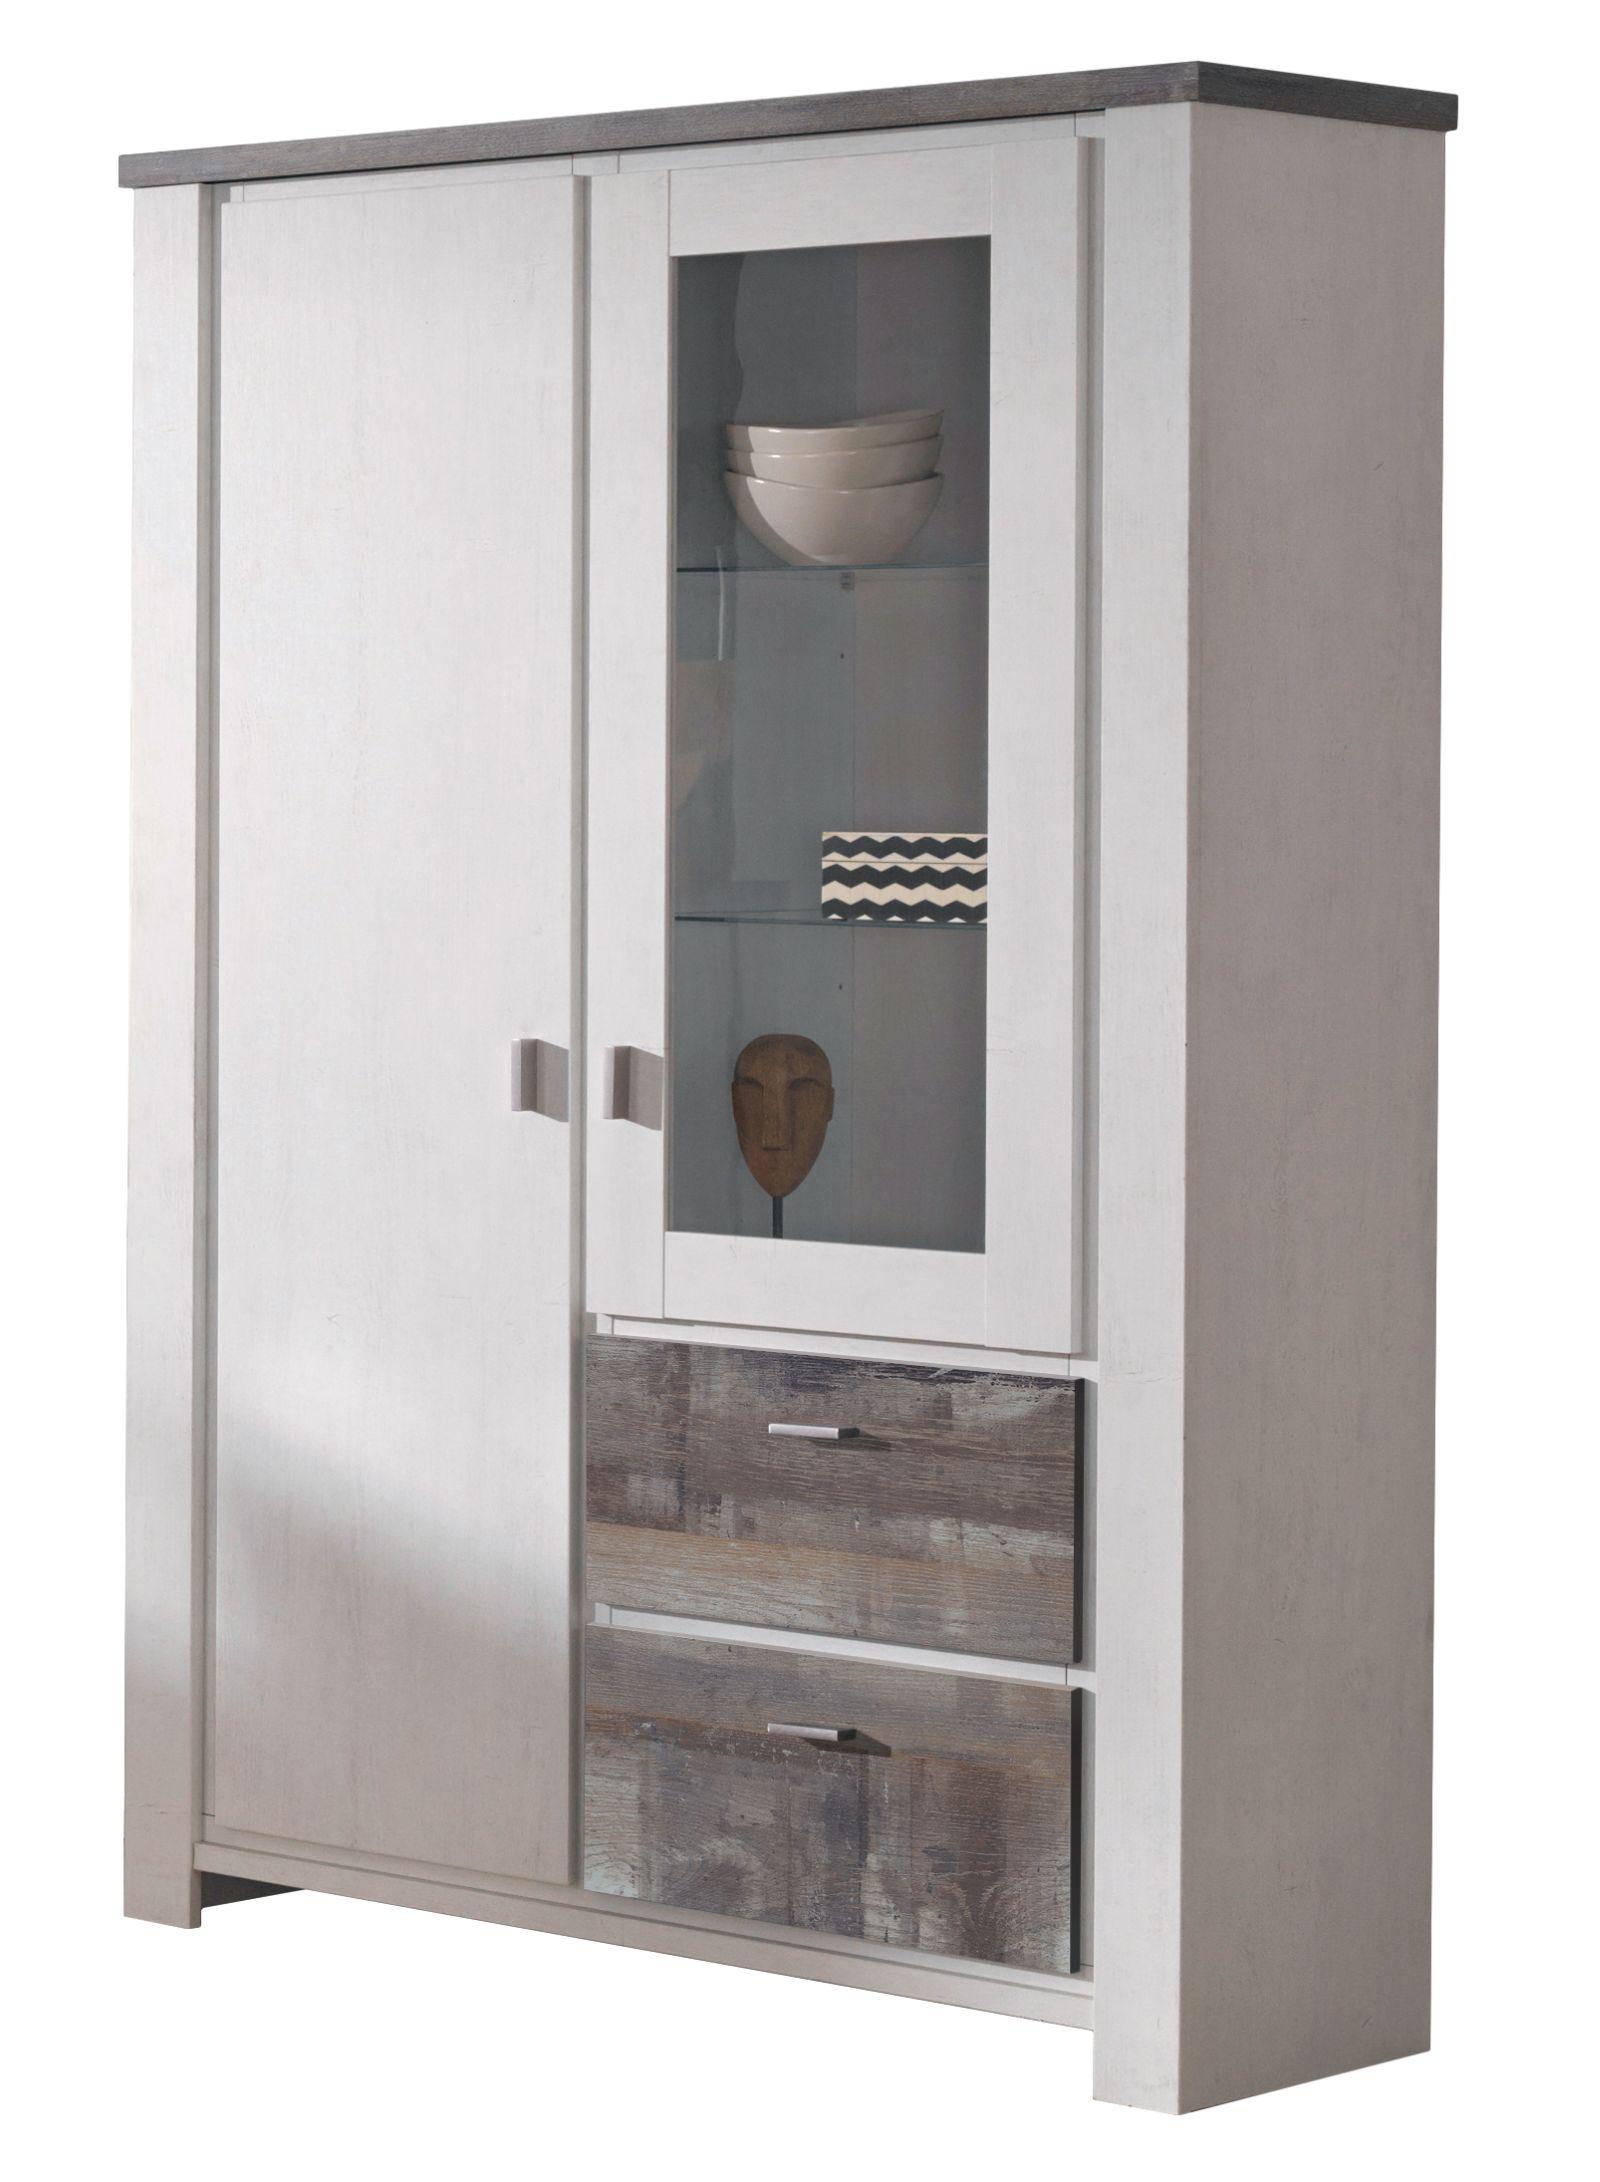 esszimmer sortiment pack zu m bel sb und k chen discount. Black Bedroom Furniture Sets. Home Design Ideas